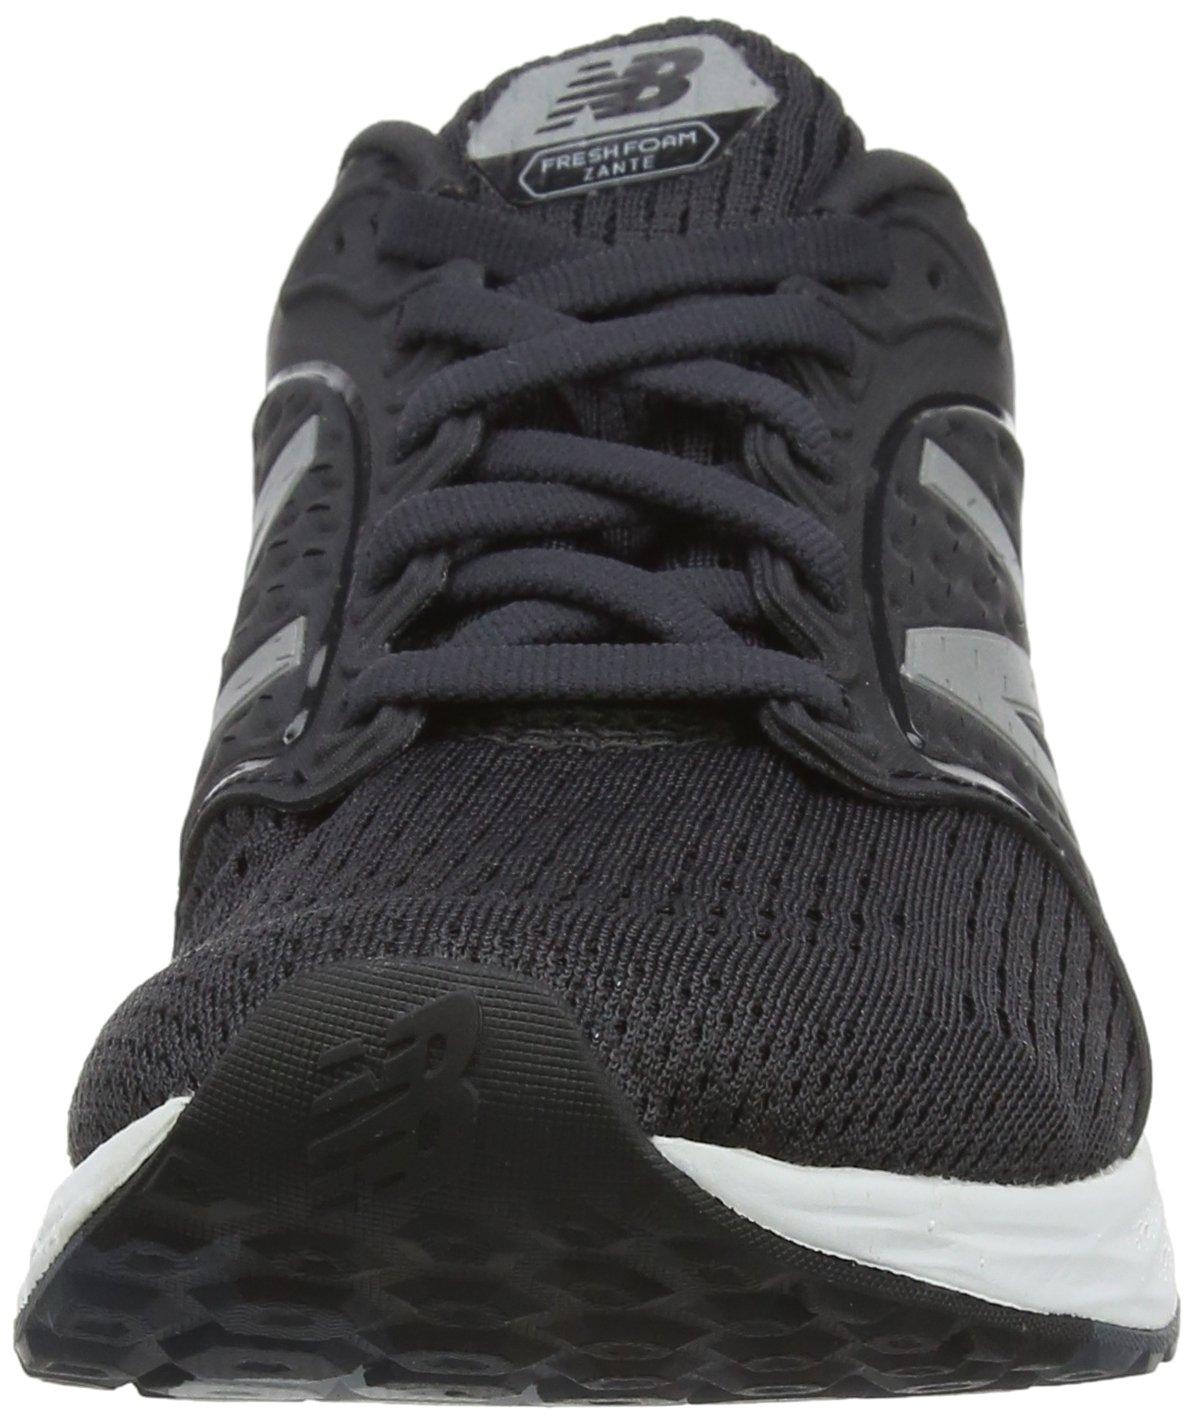 71B1pFudNEL - New Balance Women's Fresh Foam Zante V4 Neutral Running Shoes